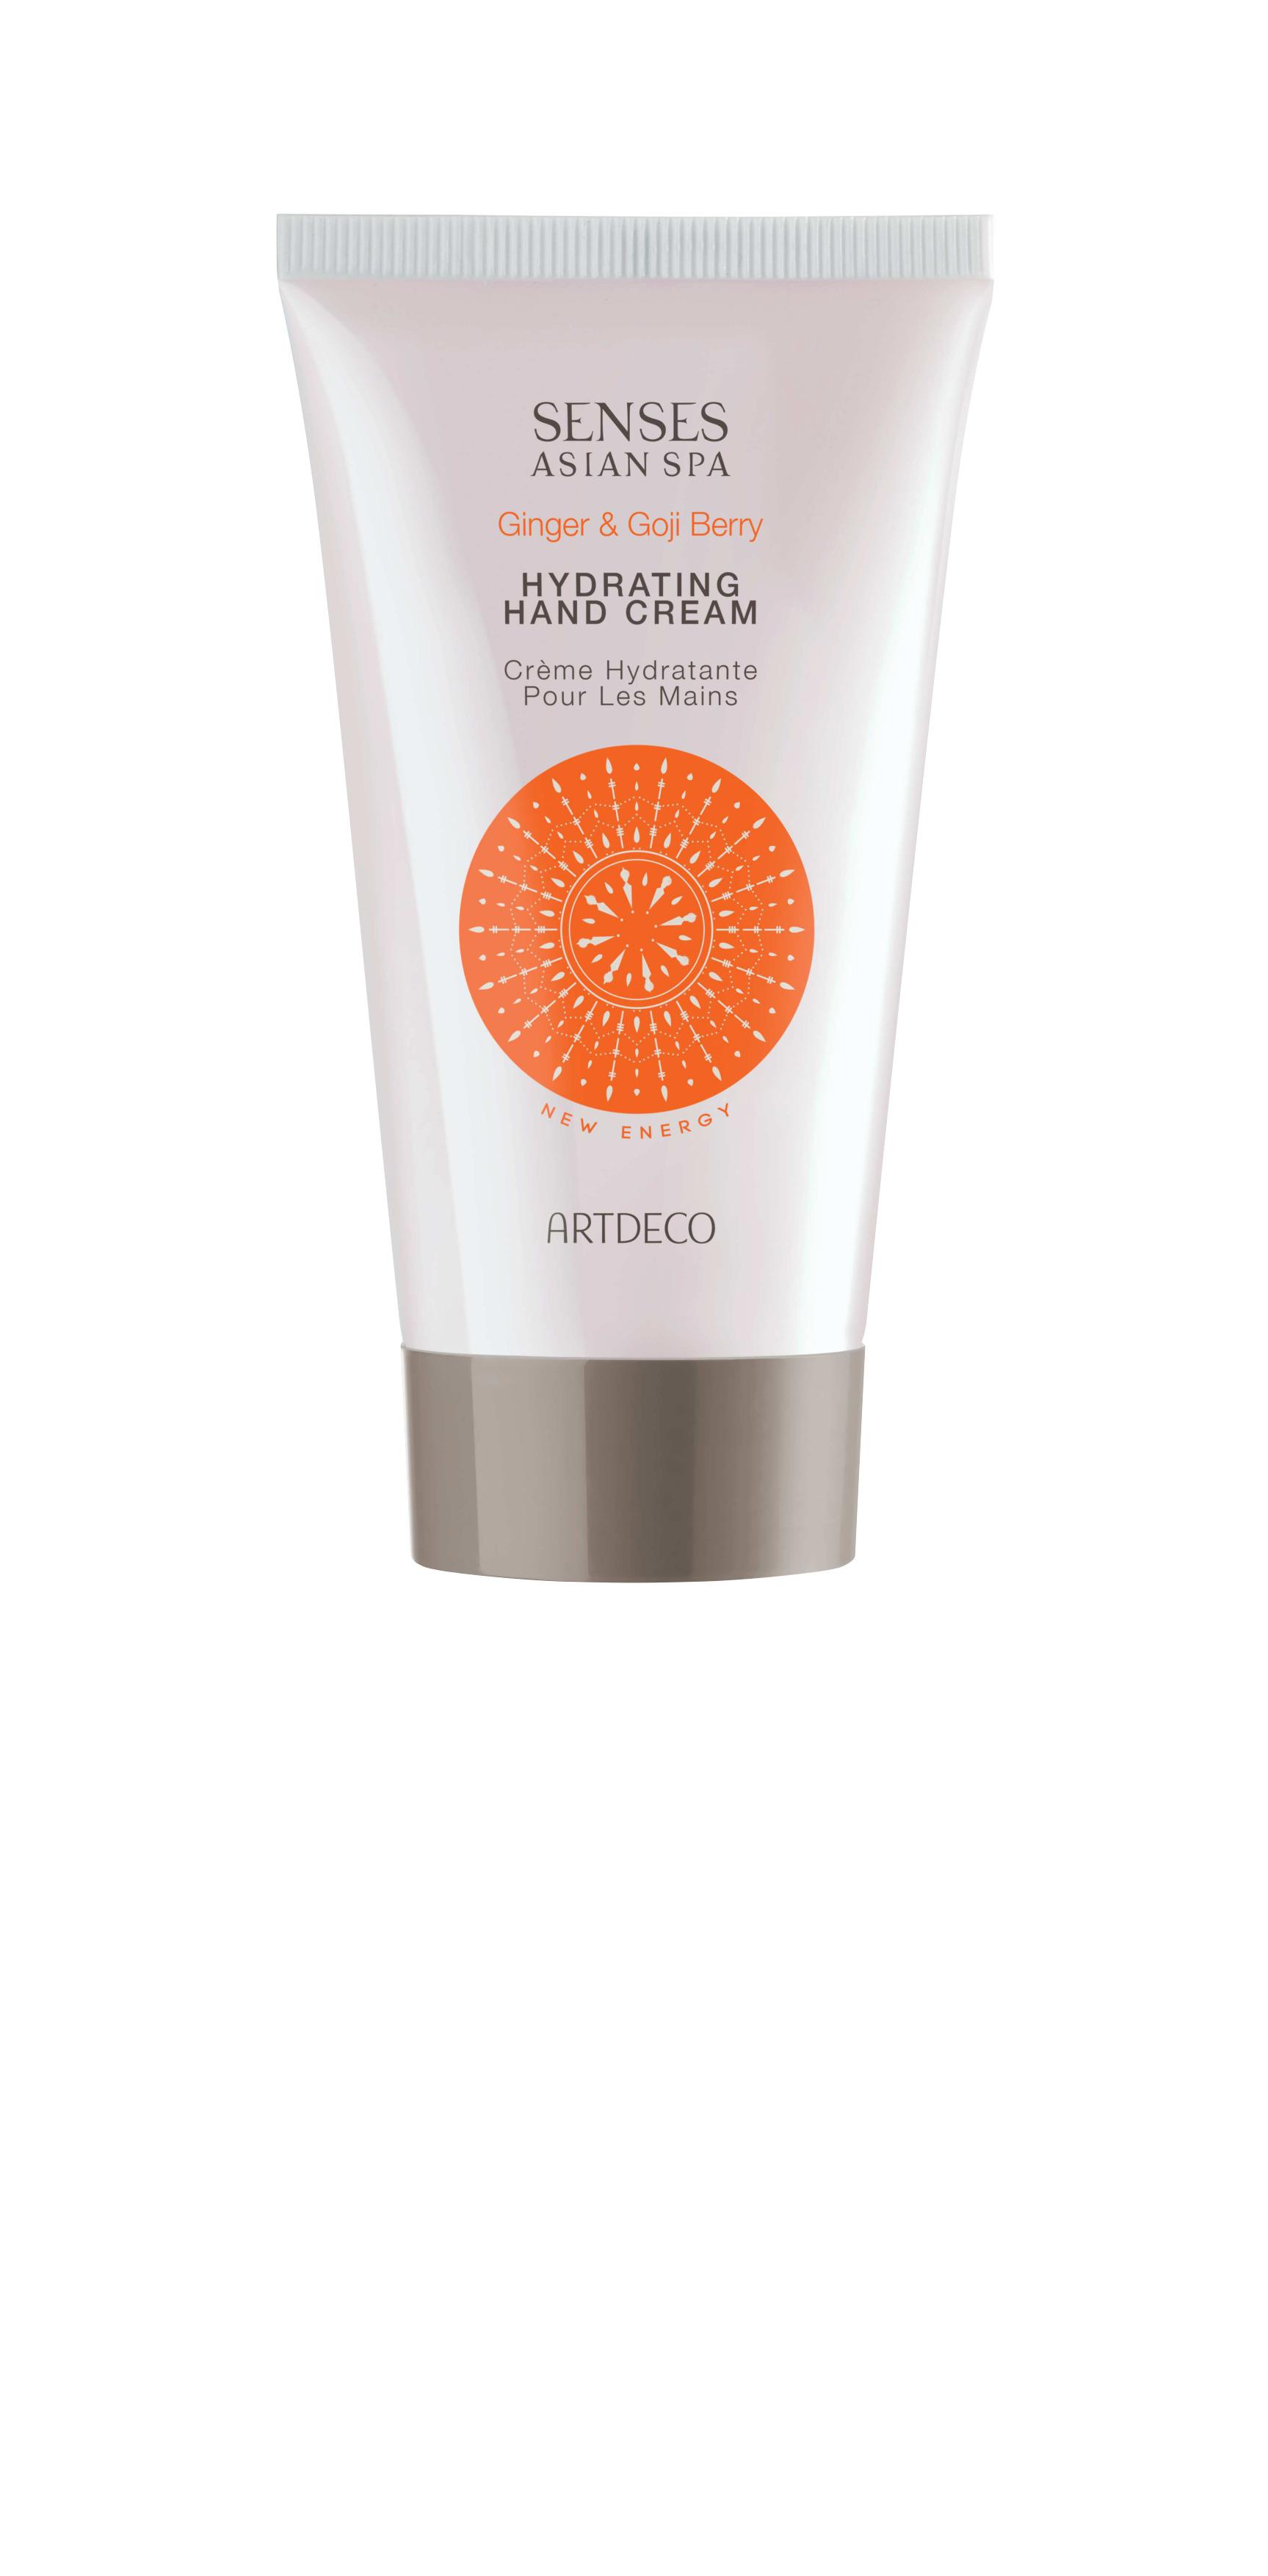 Artdeco крем для рук увлажняющий Hydrating hand cream, new energy, 75 мл atoderm hand cream